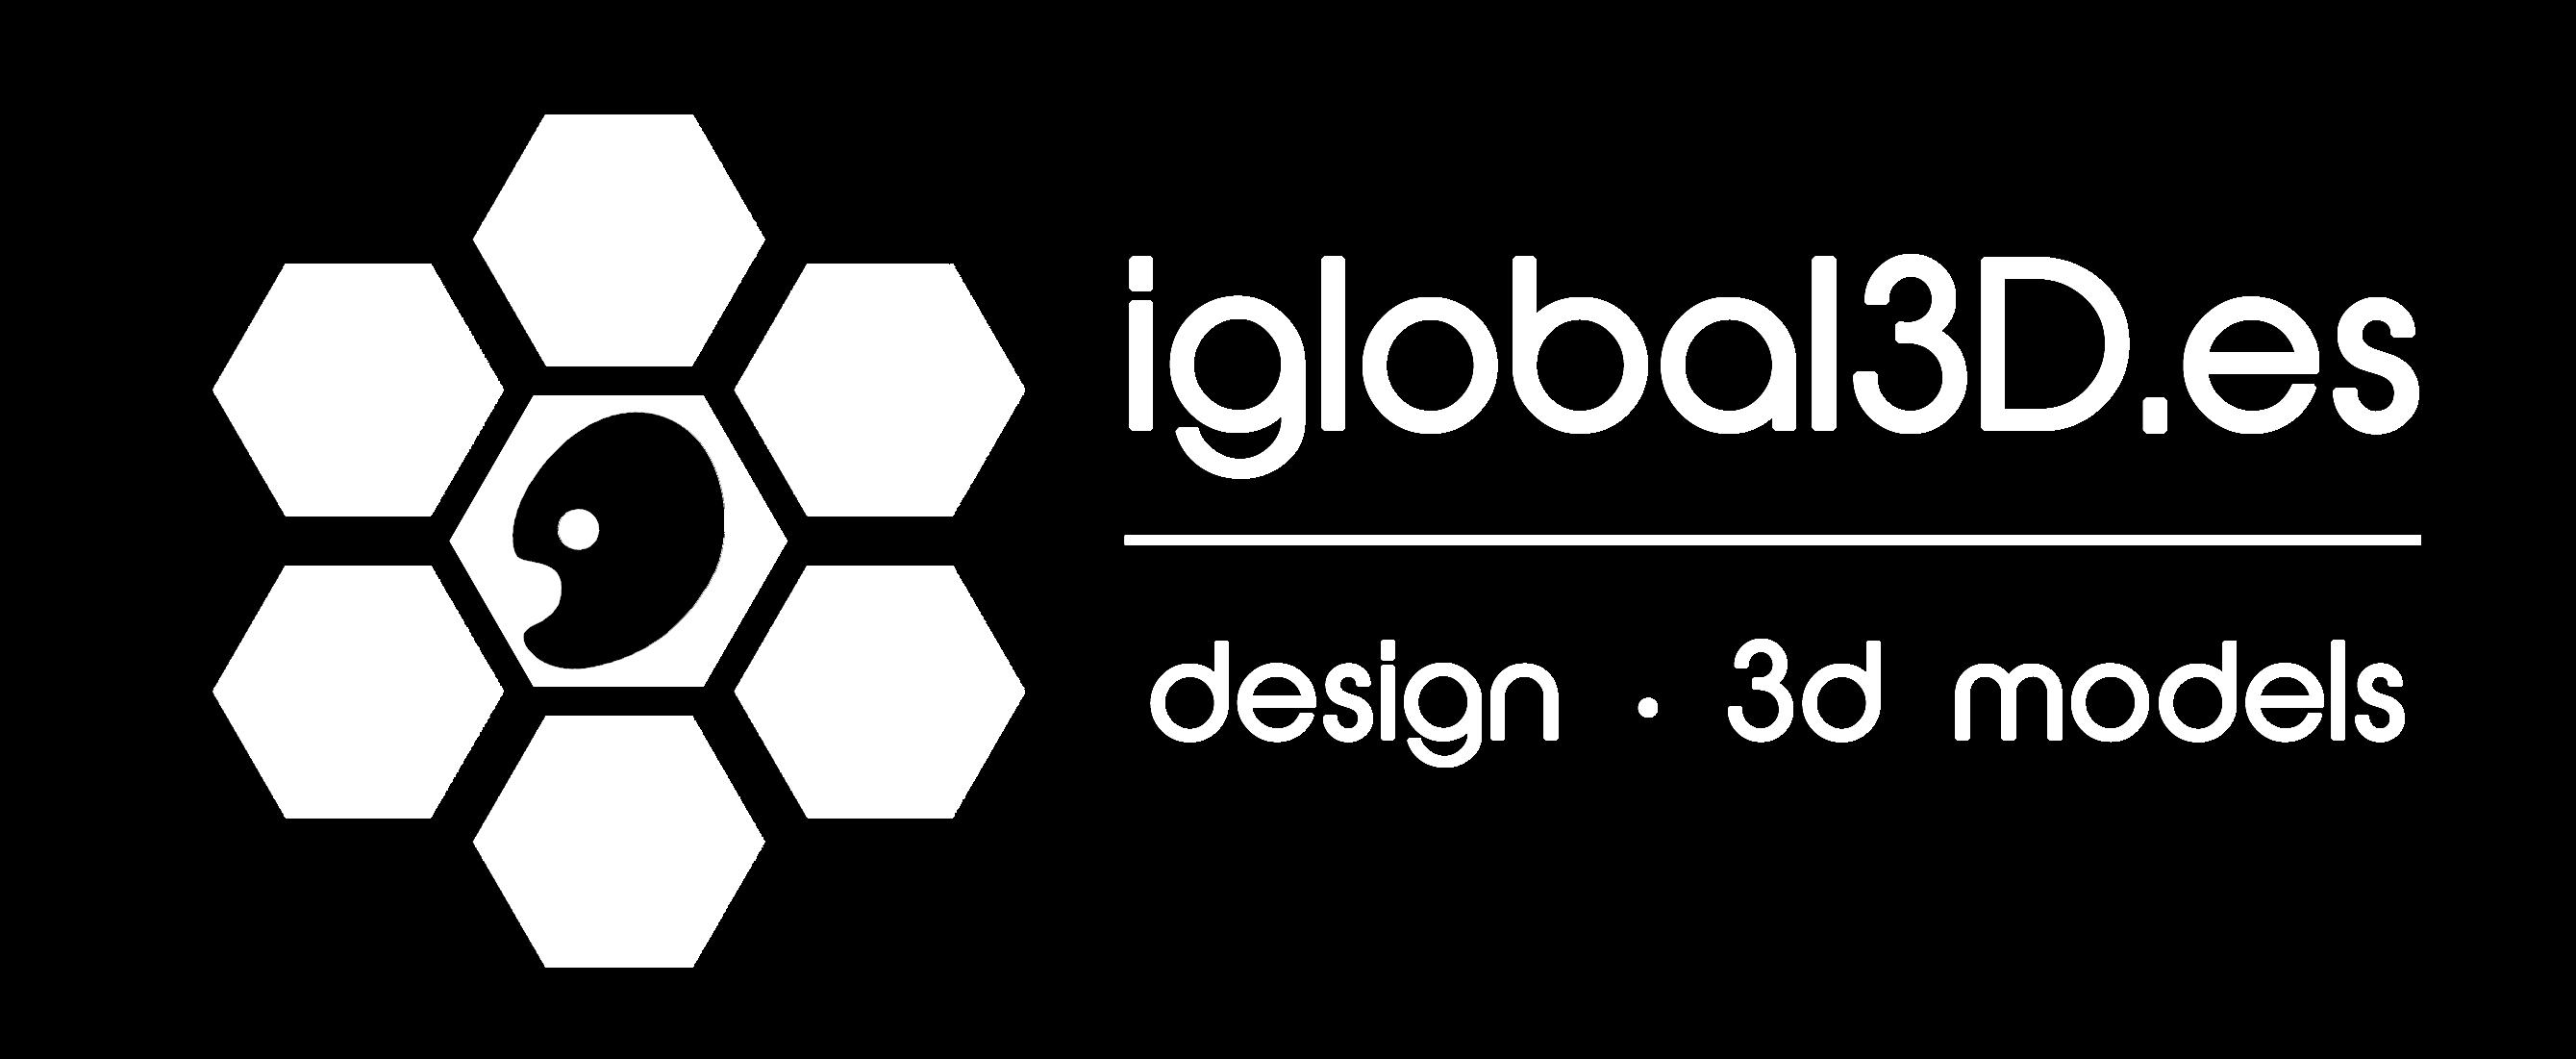 IGLOBAL3D.es – Infografia 3d y diseño gráfico – comunicación visual y  diseño. renders, arq, infografias 3d, diseño, pamplona, navarra (design – 3d models)